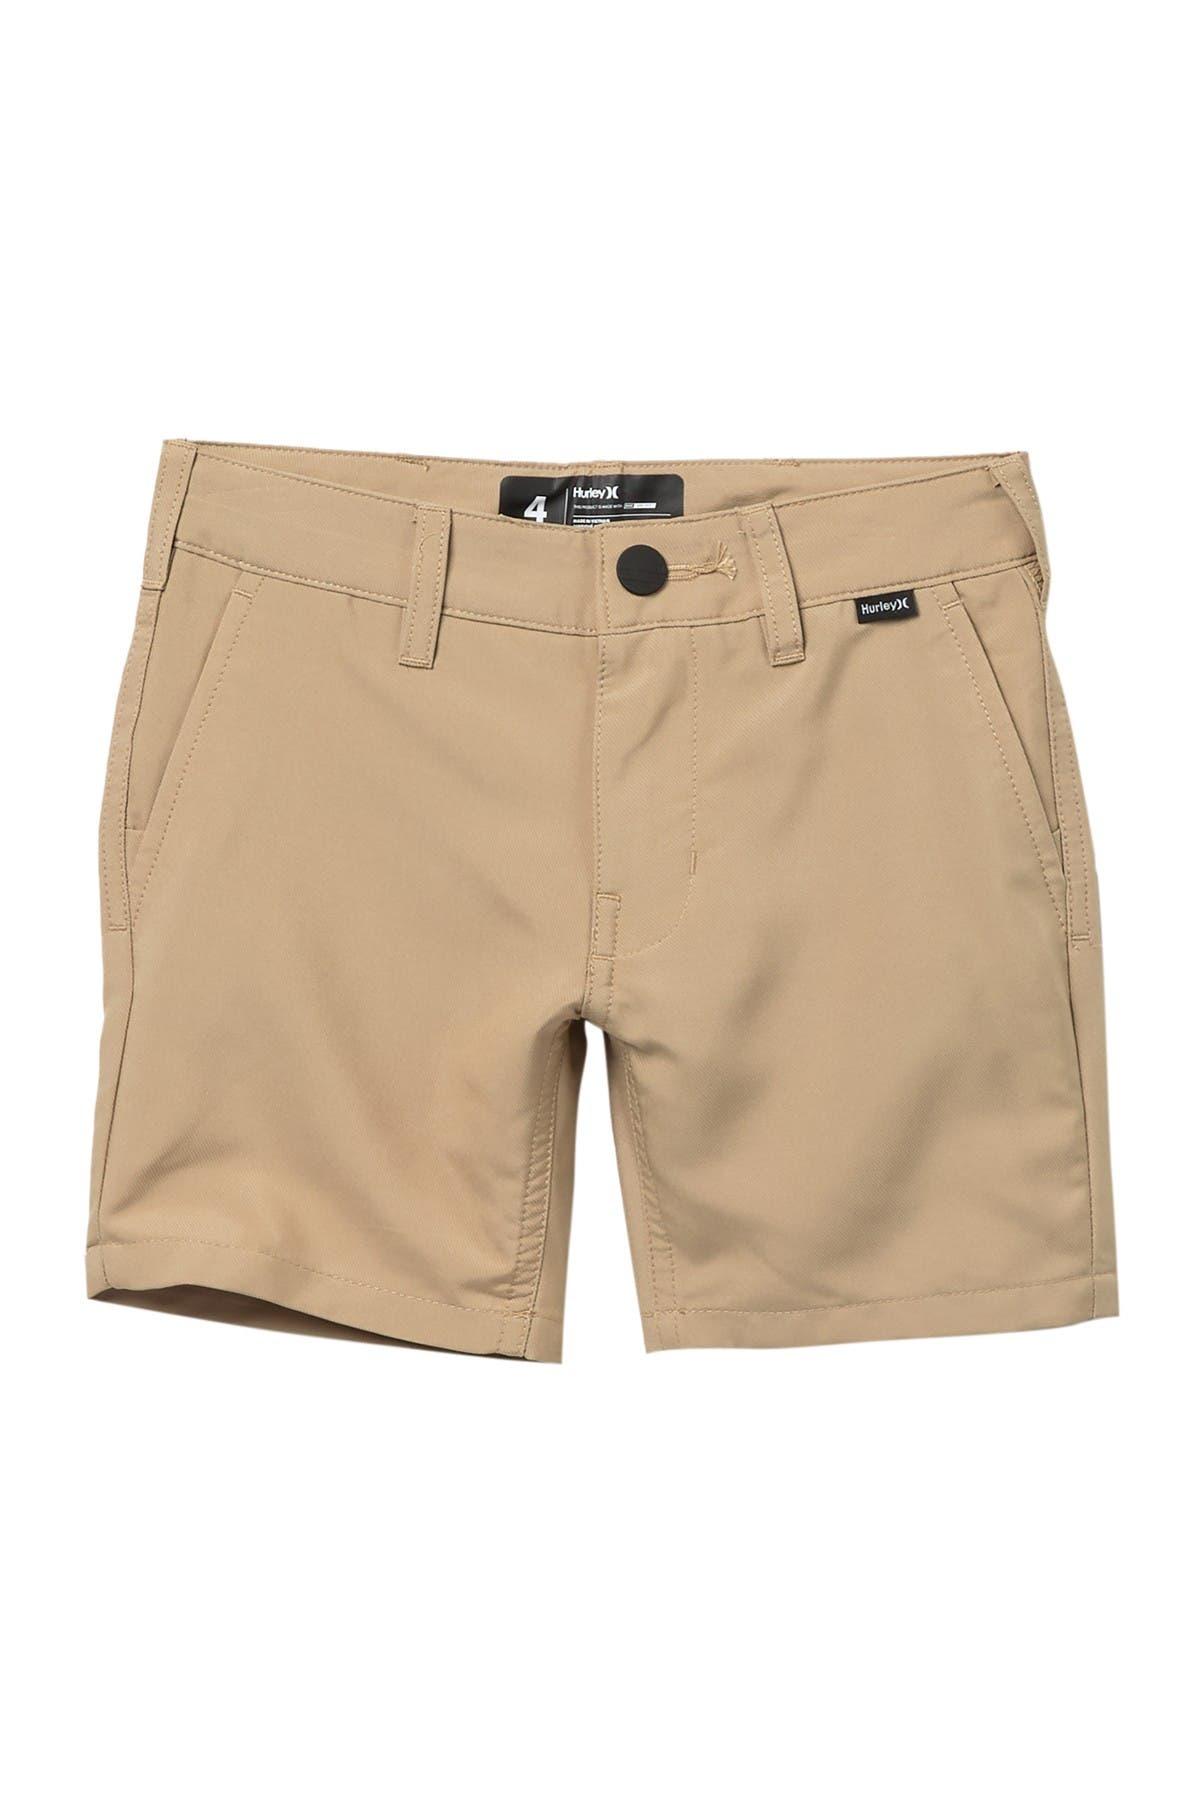 Hurley Boys Walk Shorts